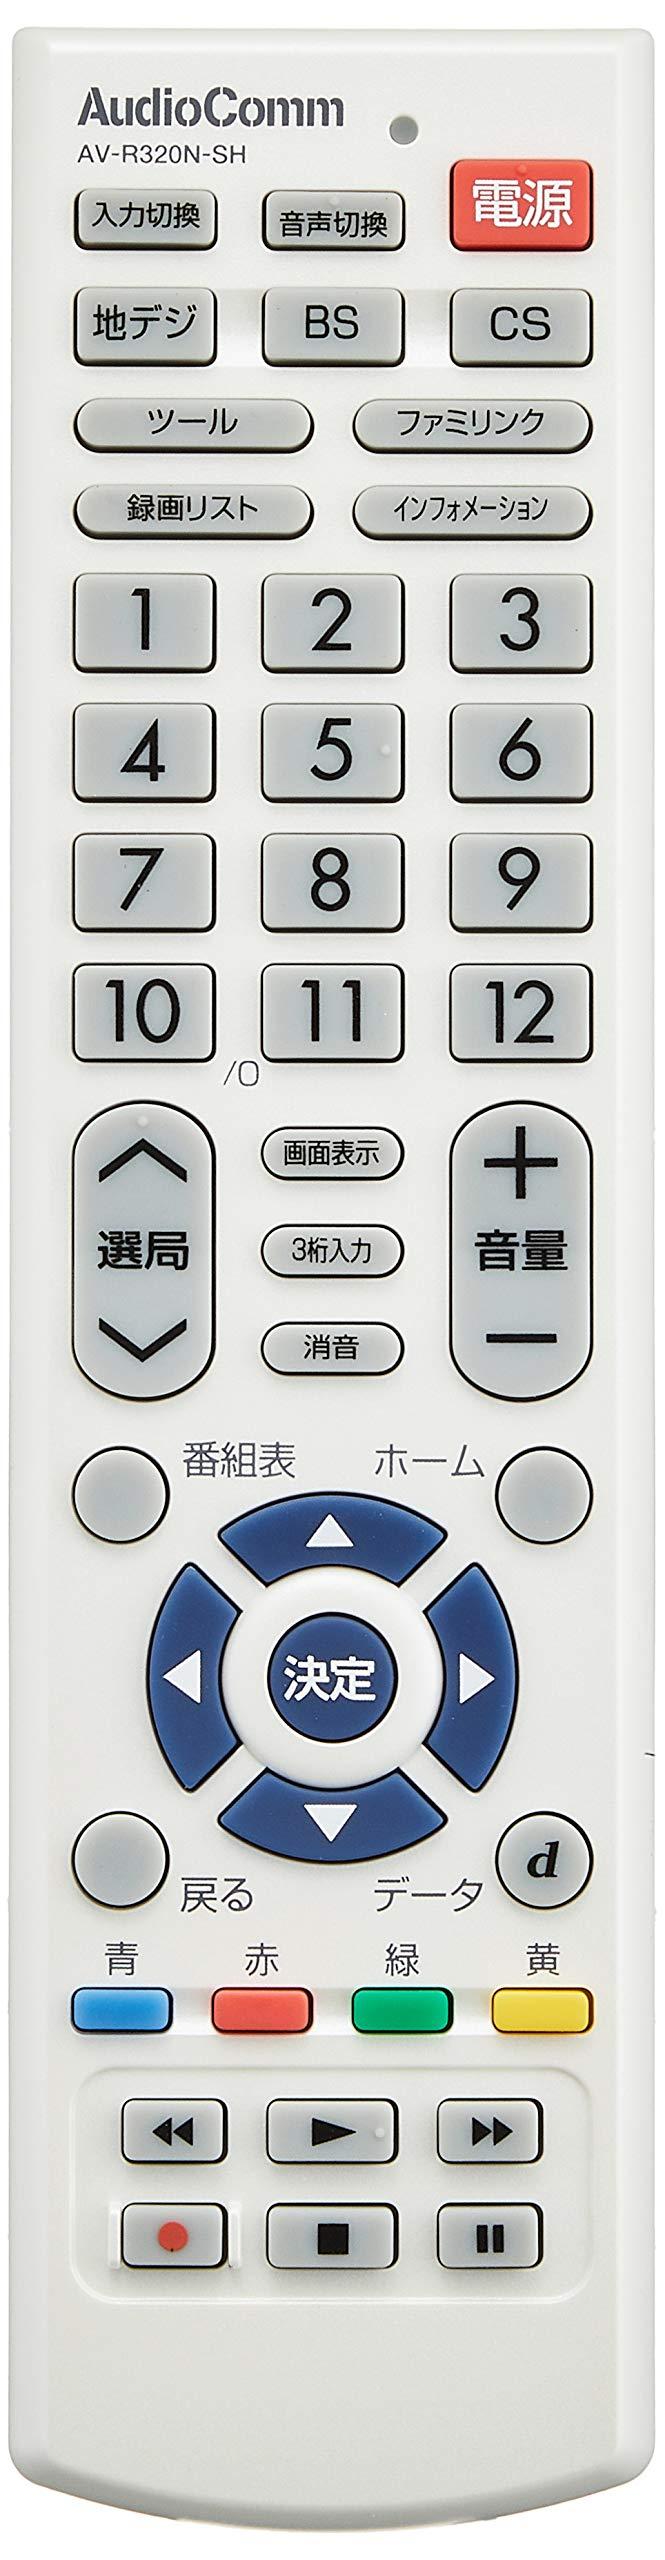 OHM シャープ アクオス用 TVリモコン AV-R320N-SH product image